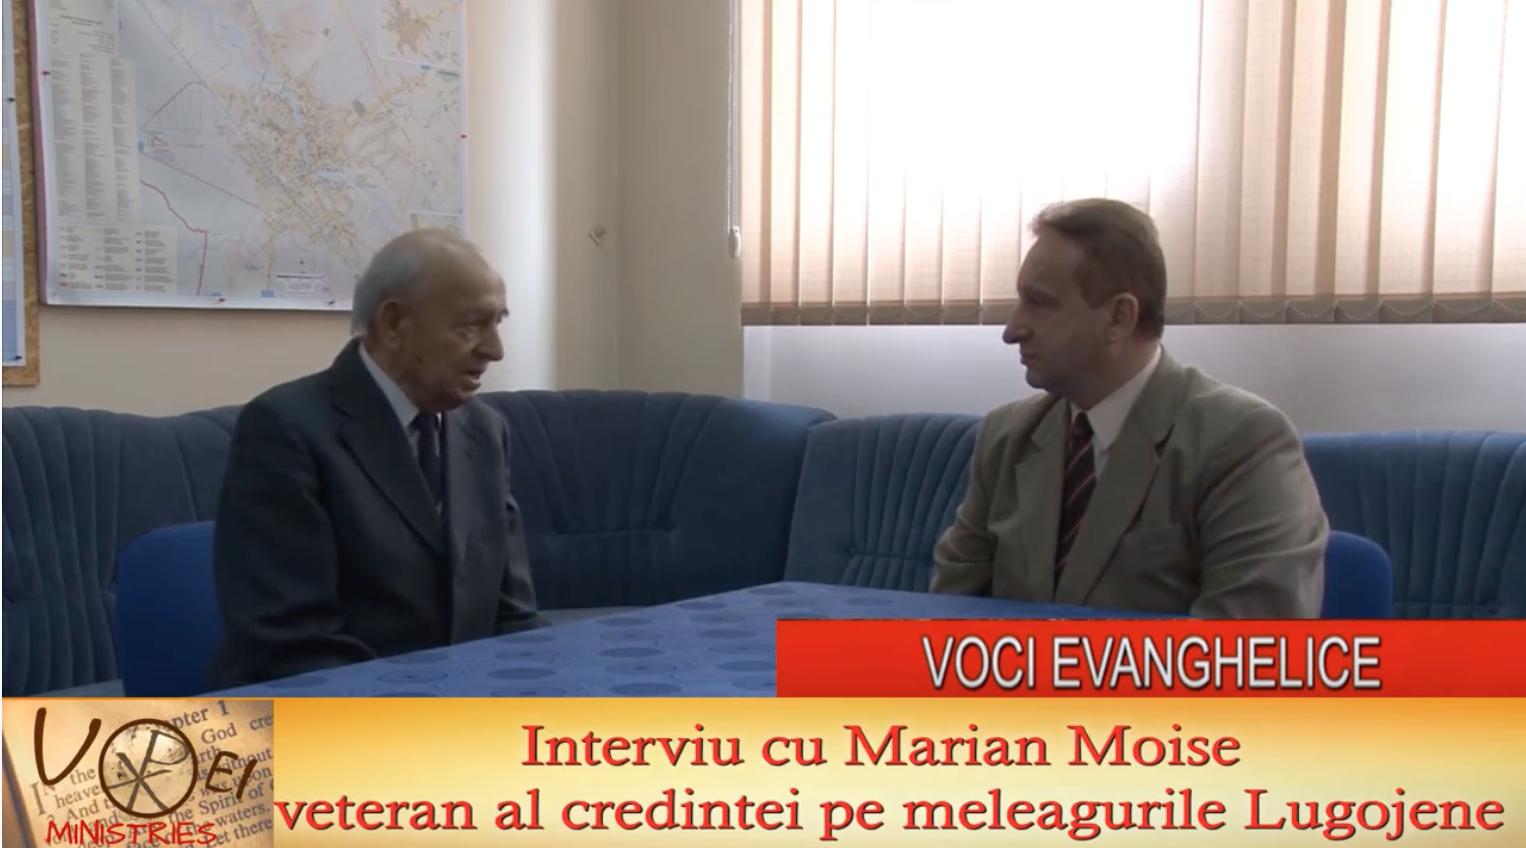 Interviu — Marian Moise și Dr. Ionel Tutac